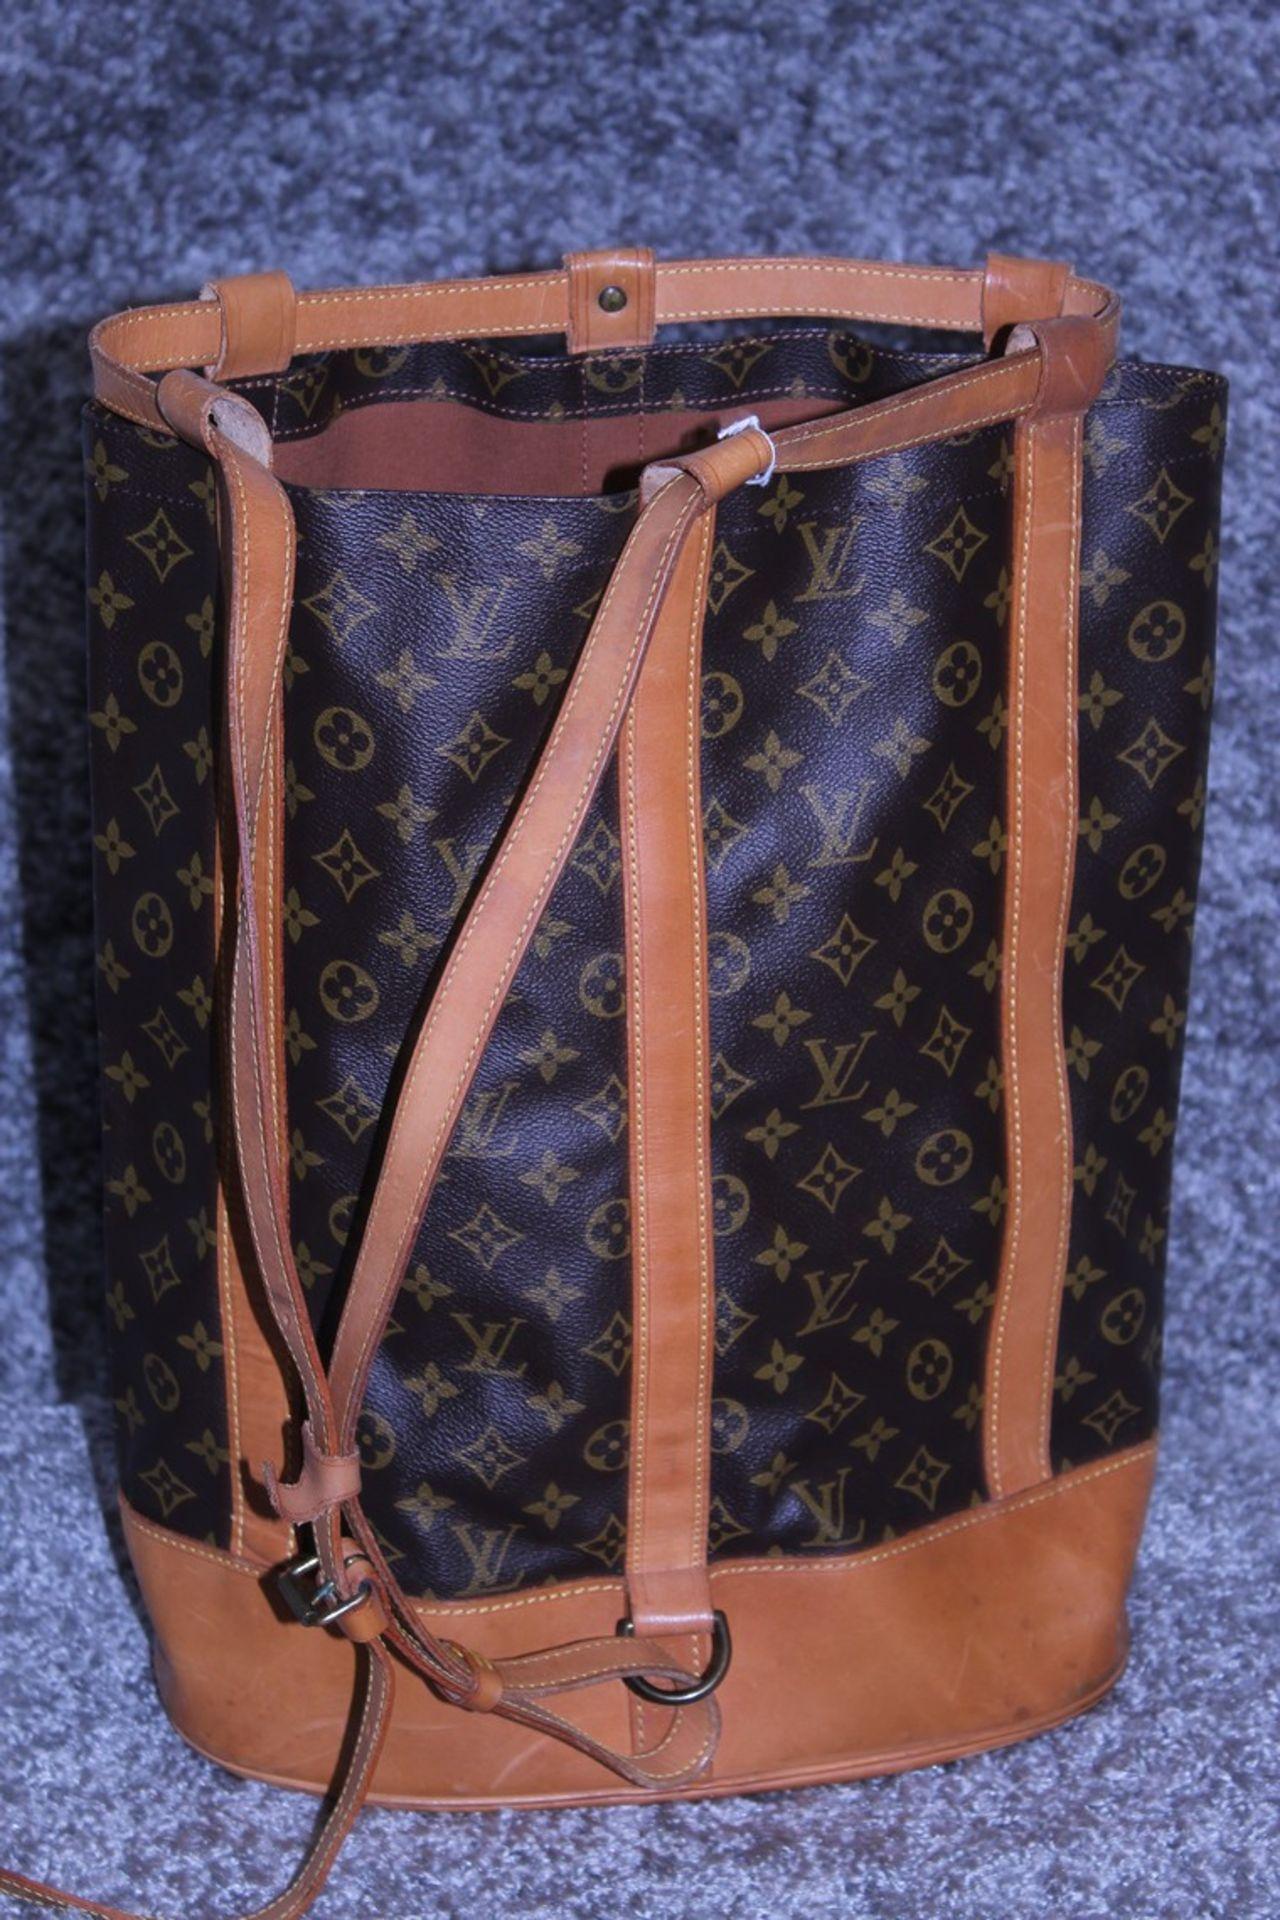 RRP £1,800 Louis Vuitton Randonnee Shoulder Bag, Brown Monogram Coated Canvas, Vachetta Handles, ( - Image 2 of 4